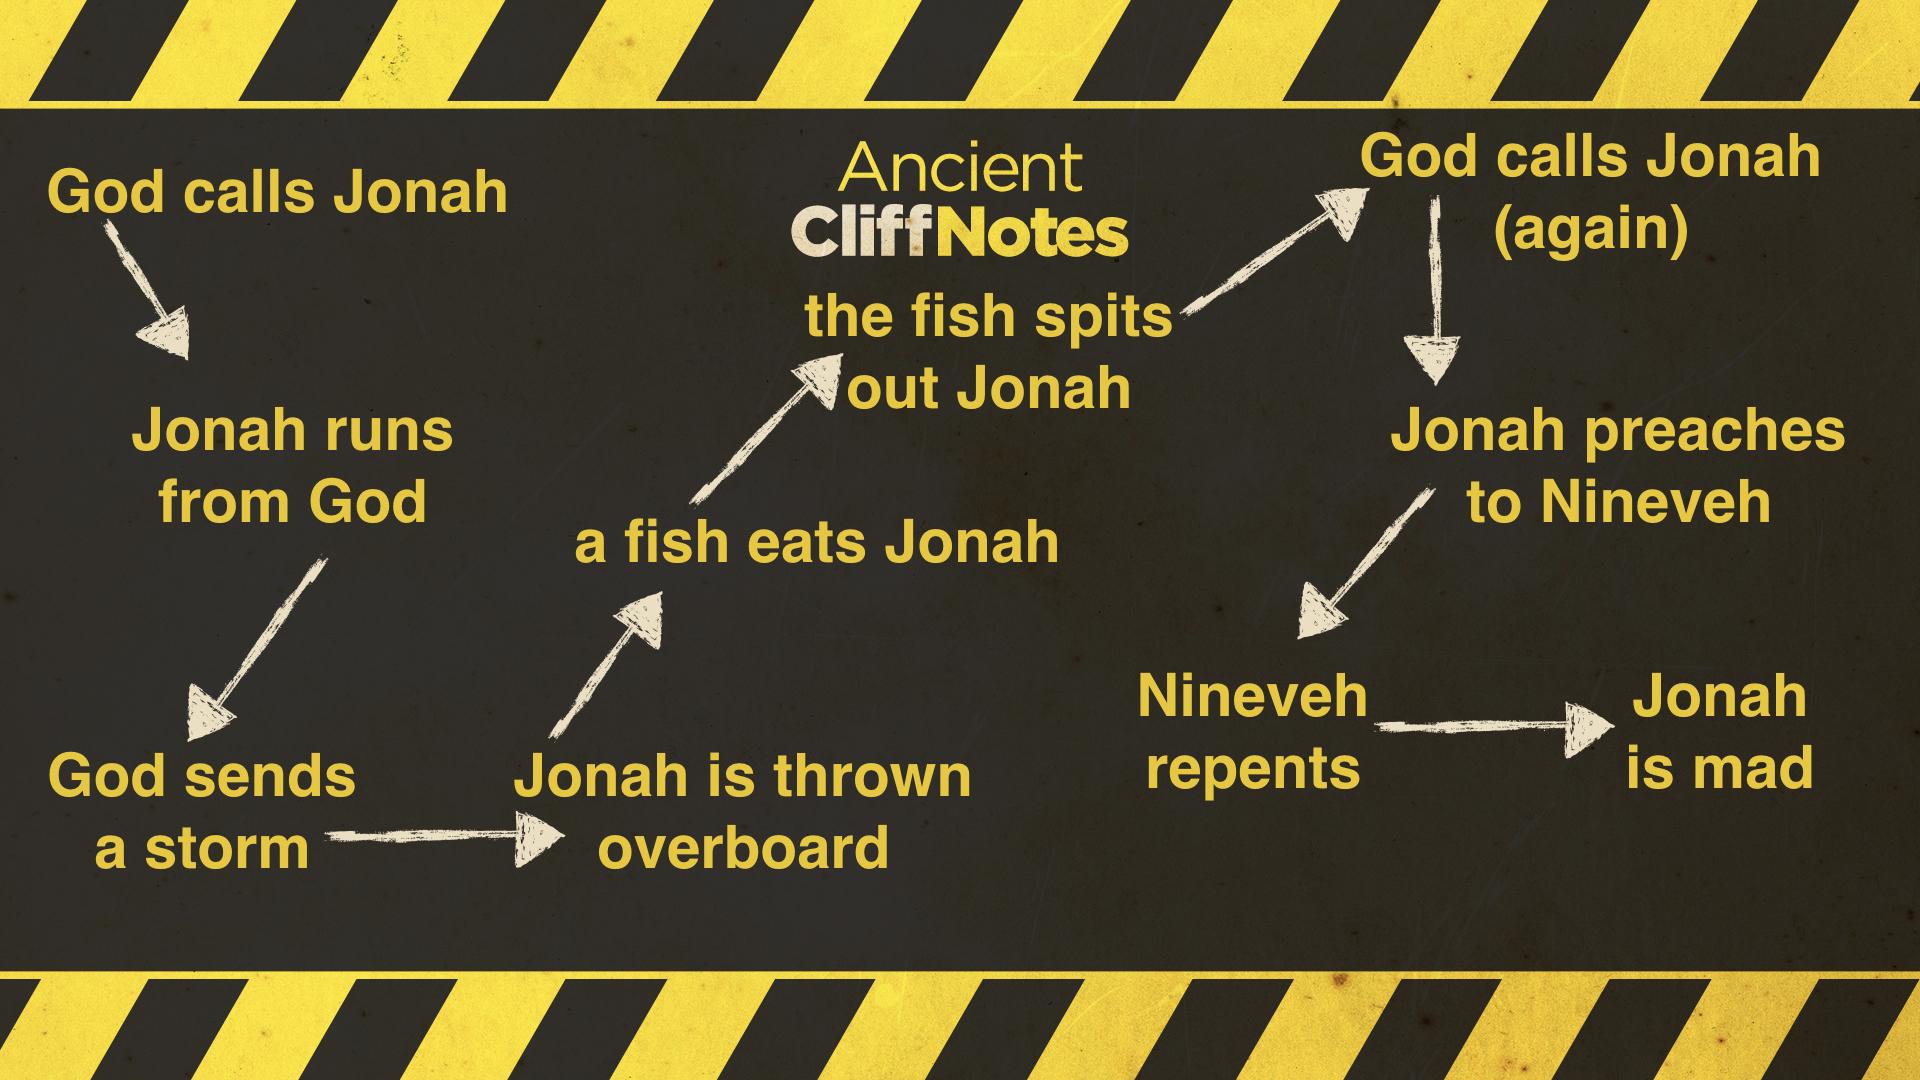 Jonah (ancient cliff notes).048.jpeg